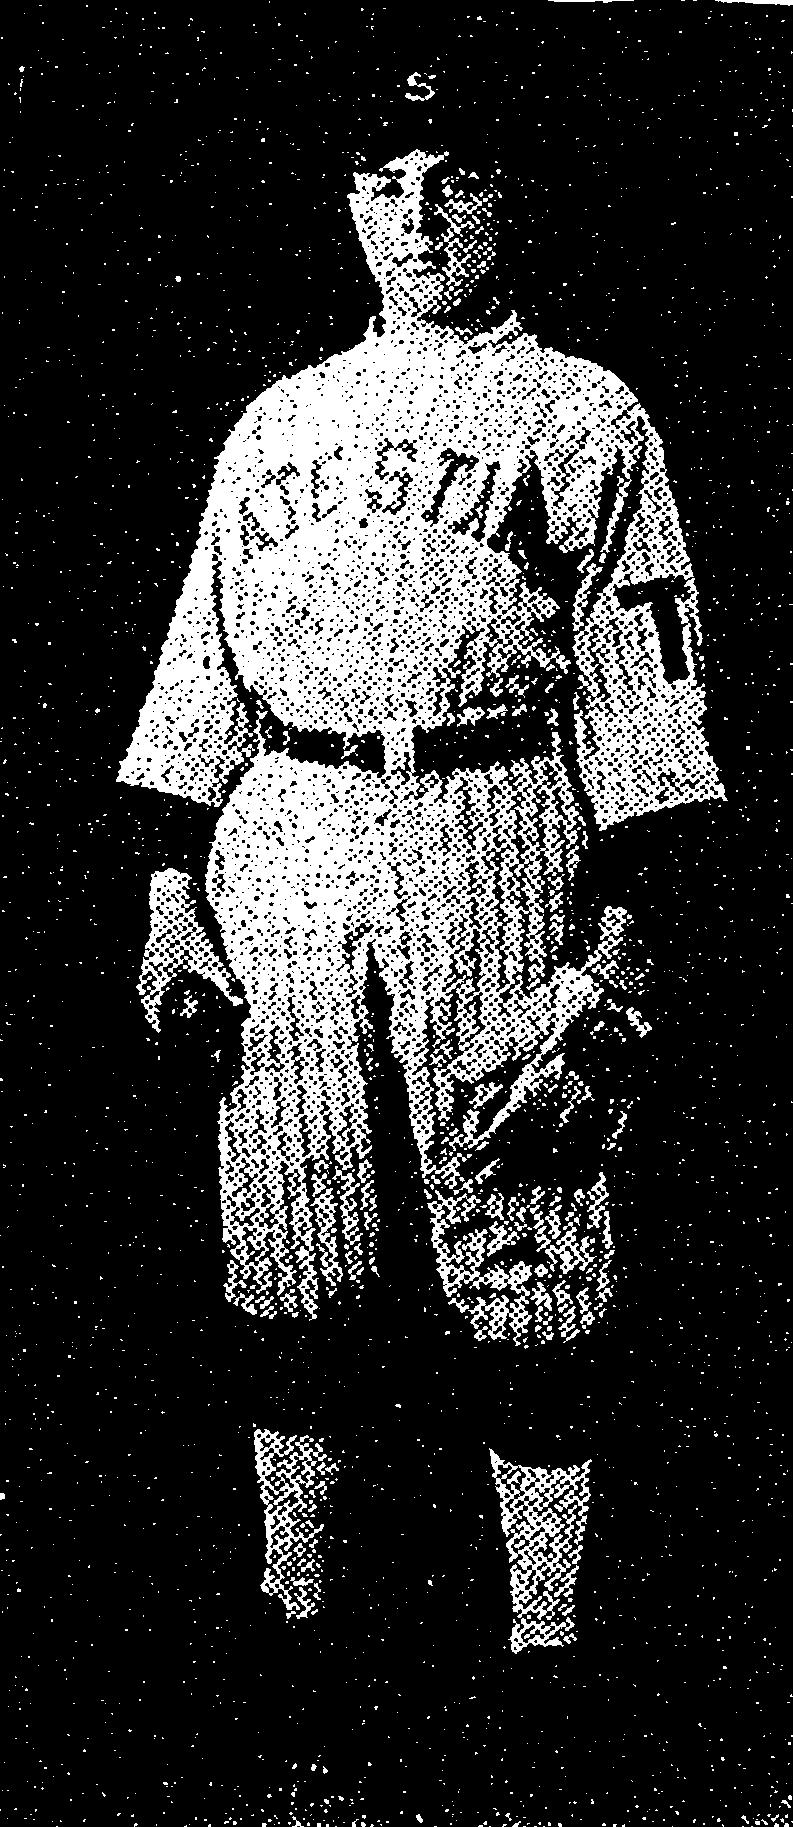 Unknown Tate Stars Player_1921